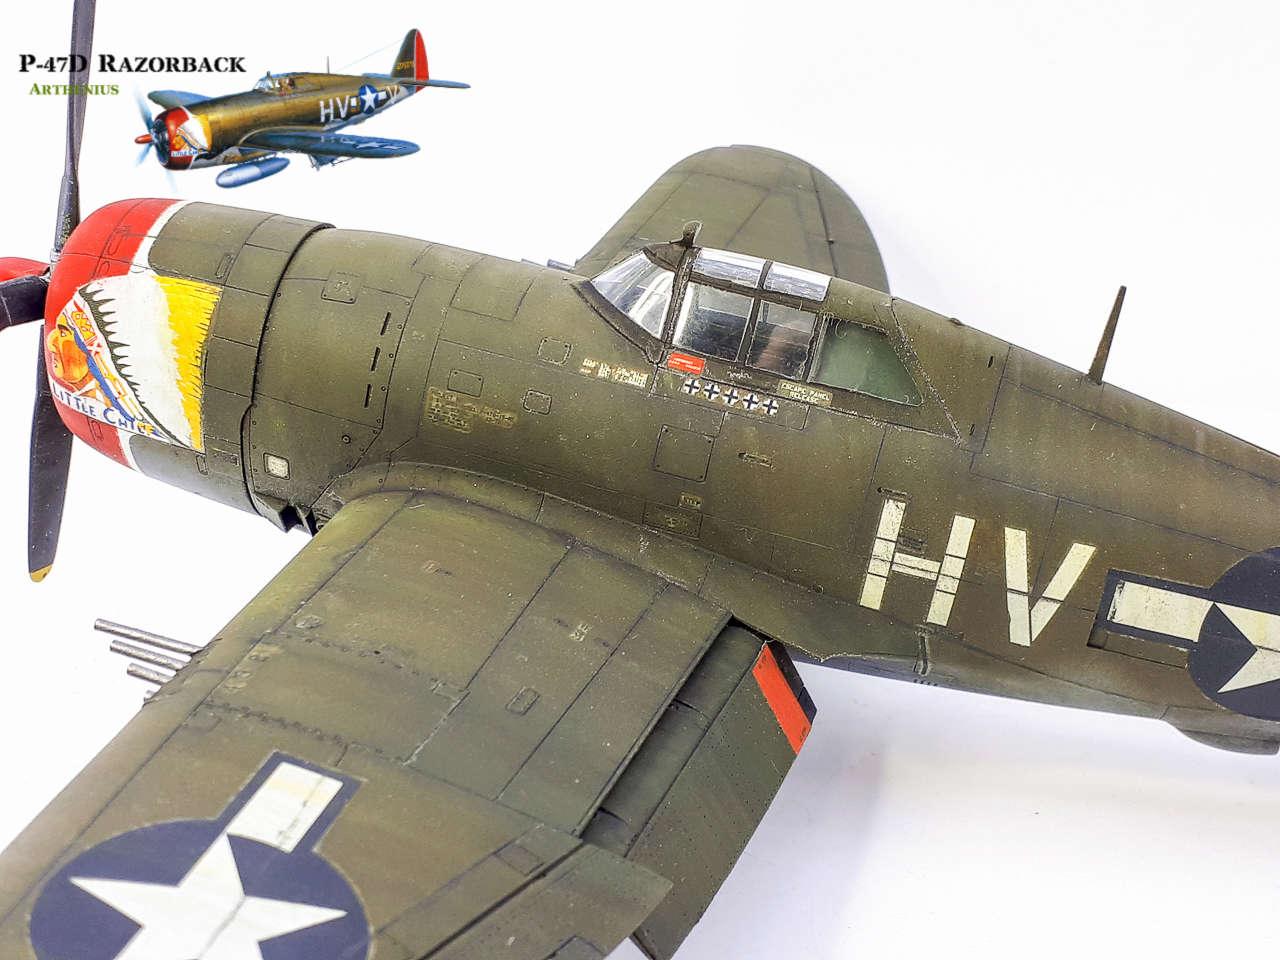 P-47D Razorback - Tamiya 1/48eme + PE Eduard - Page 4 2018-303